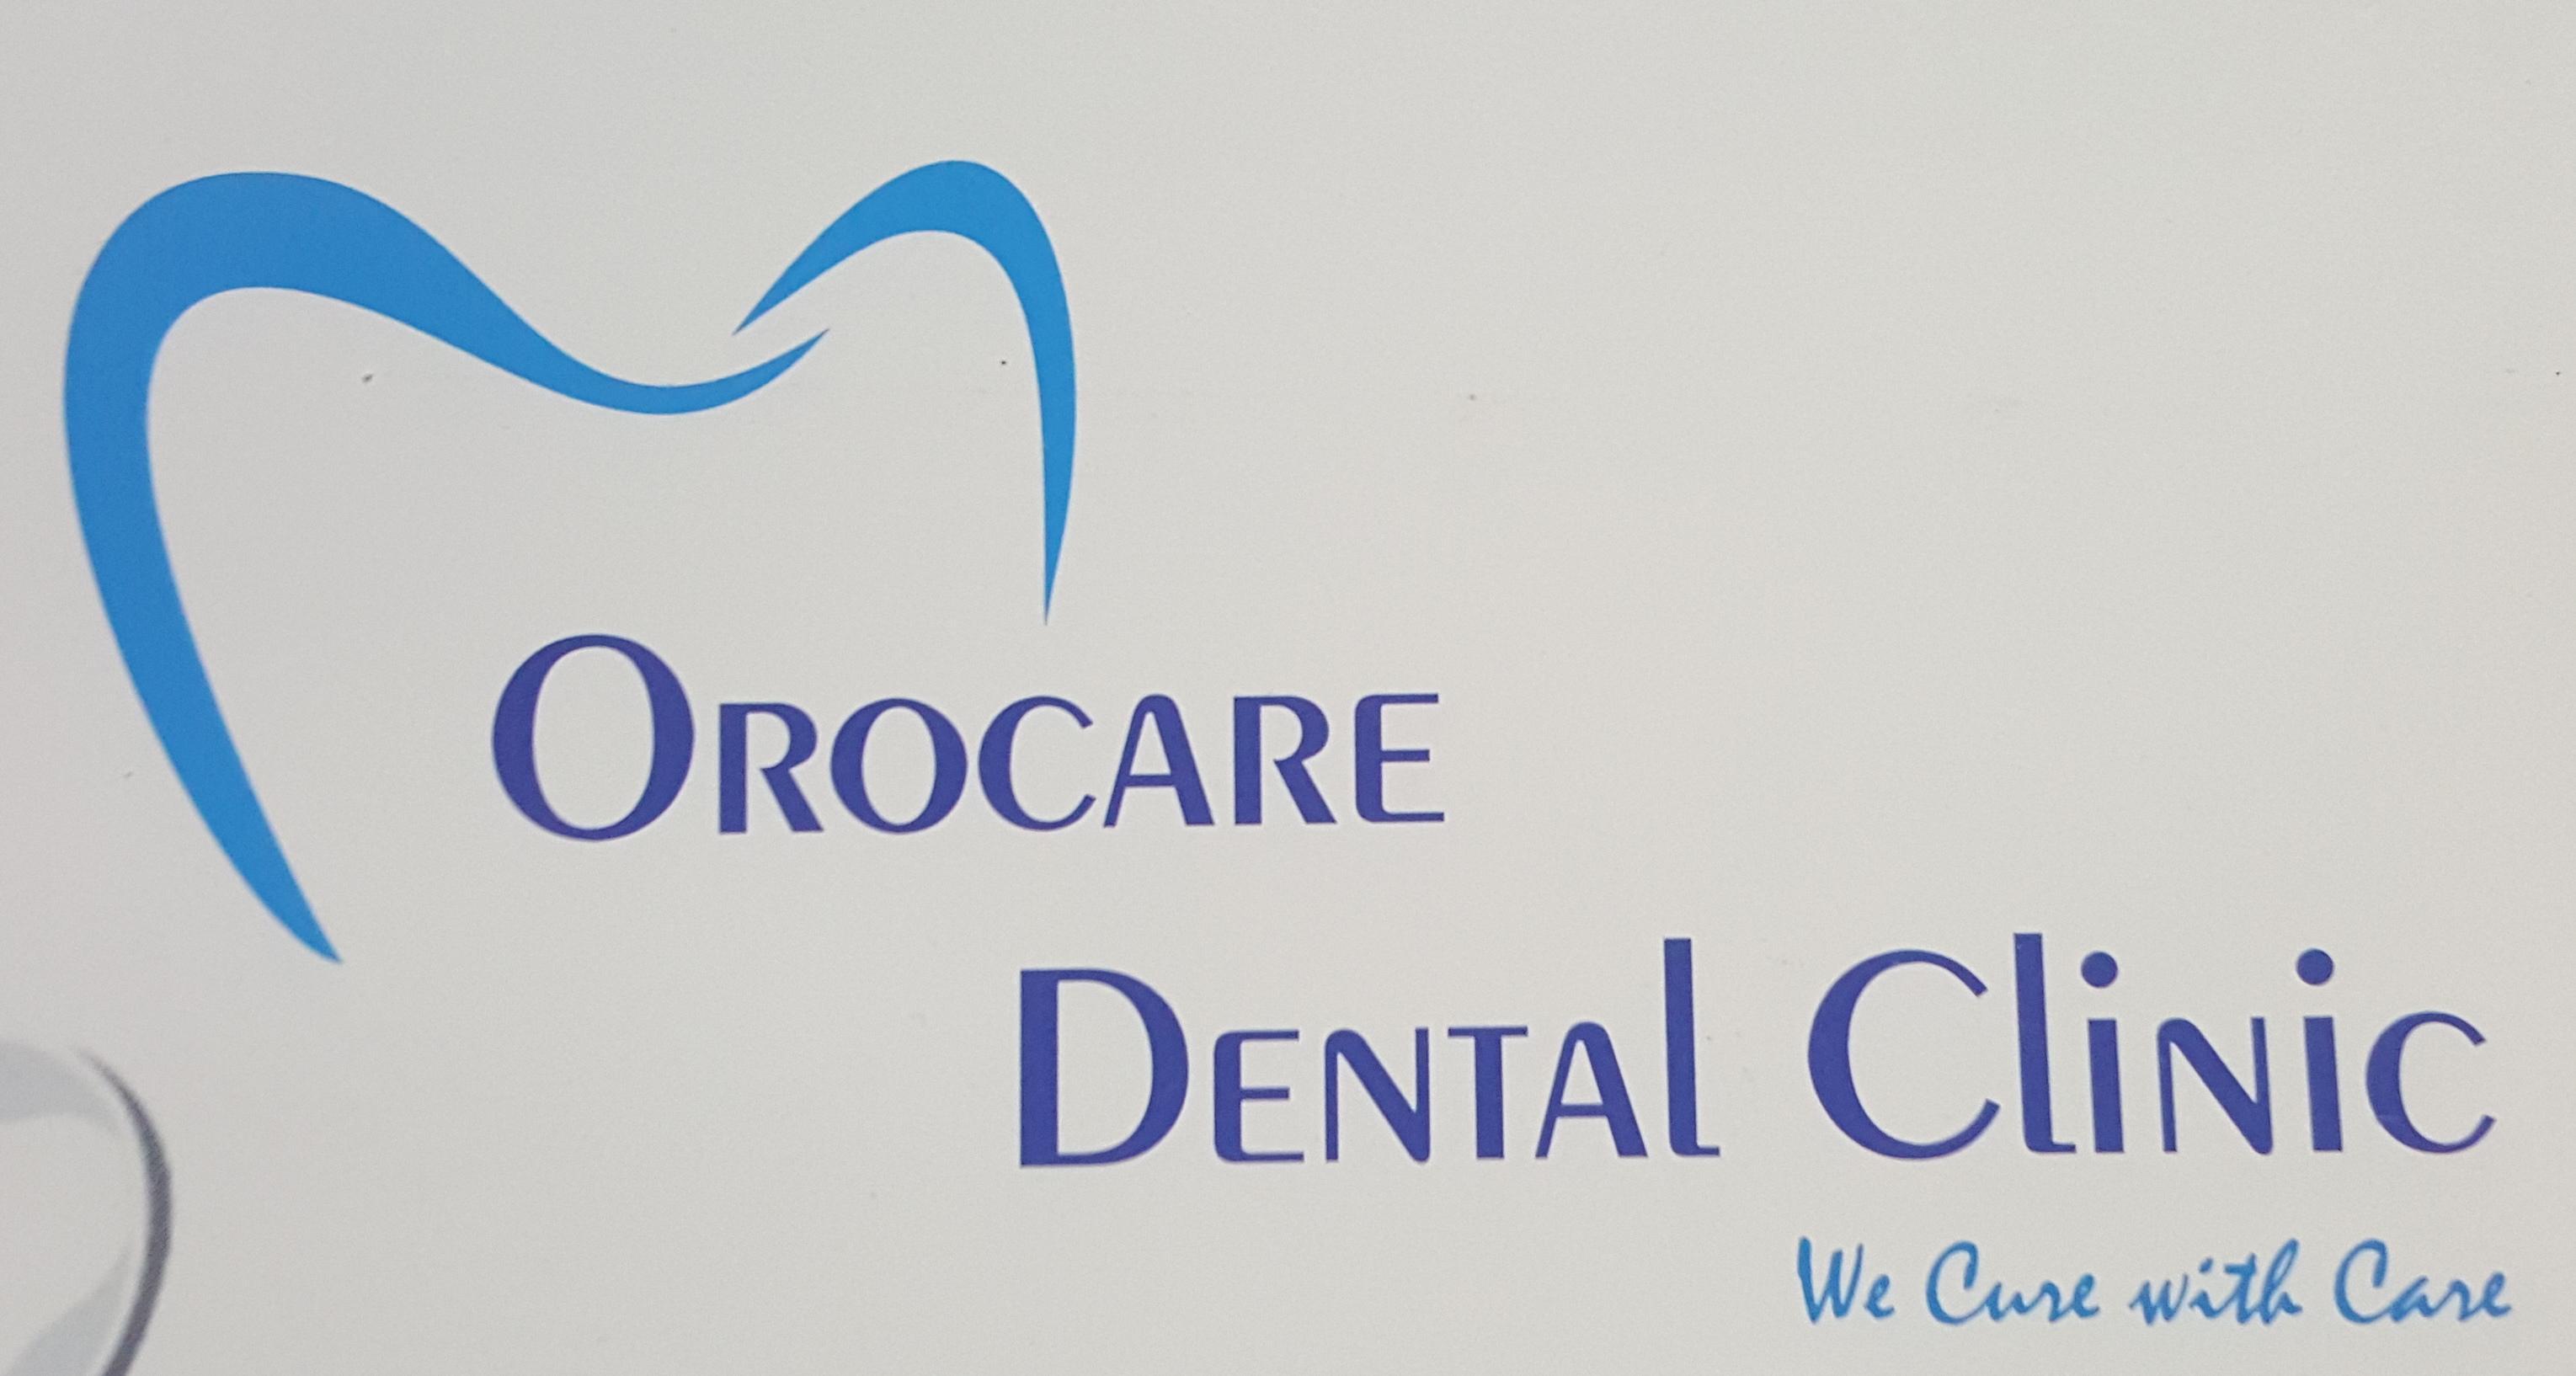 OroCare Dental Clinic